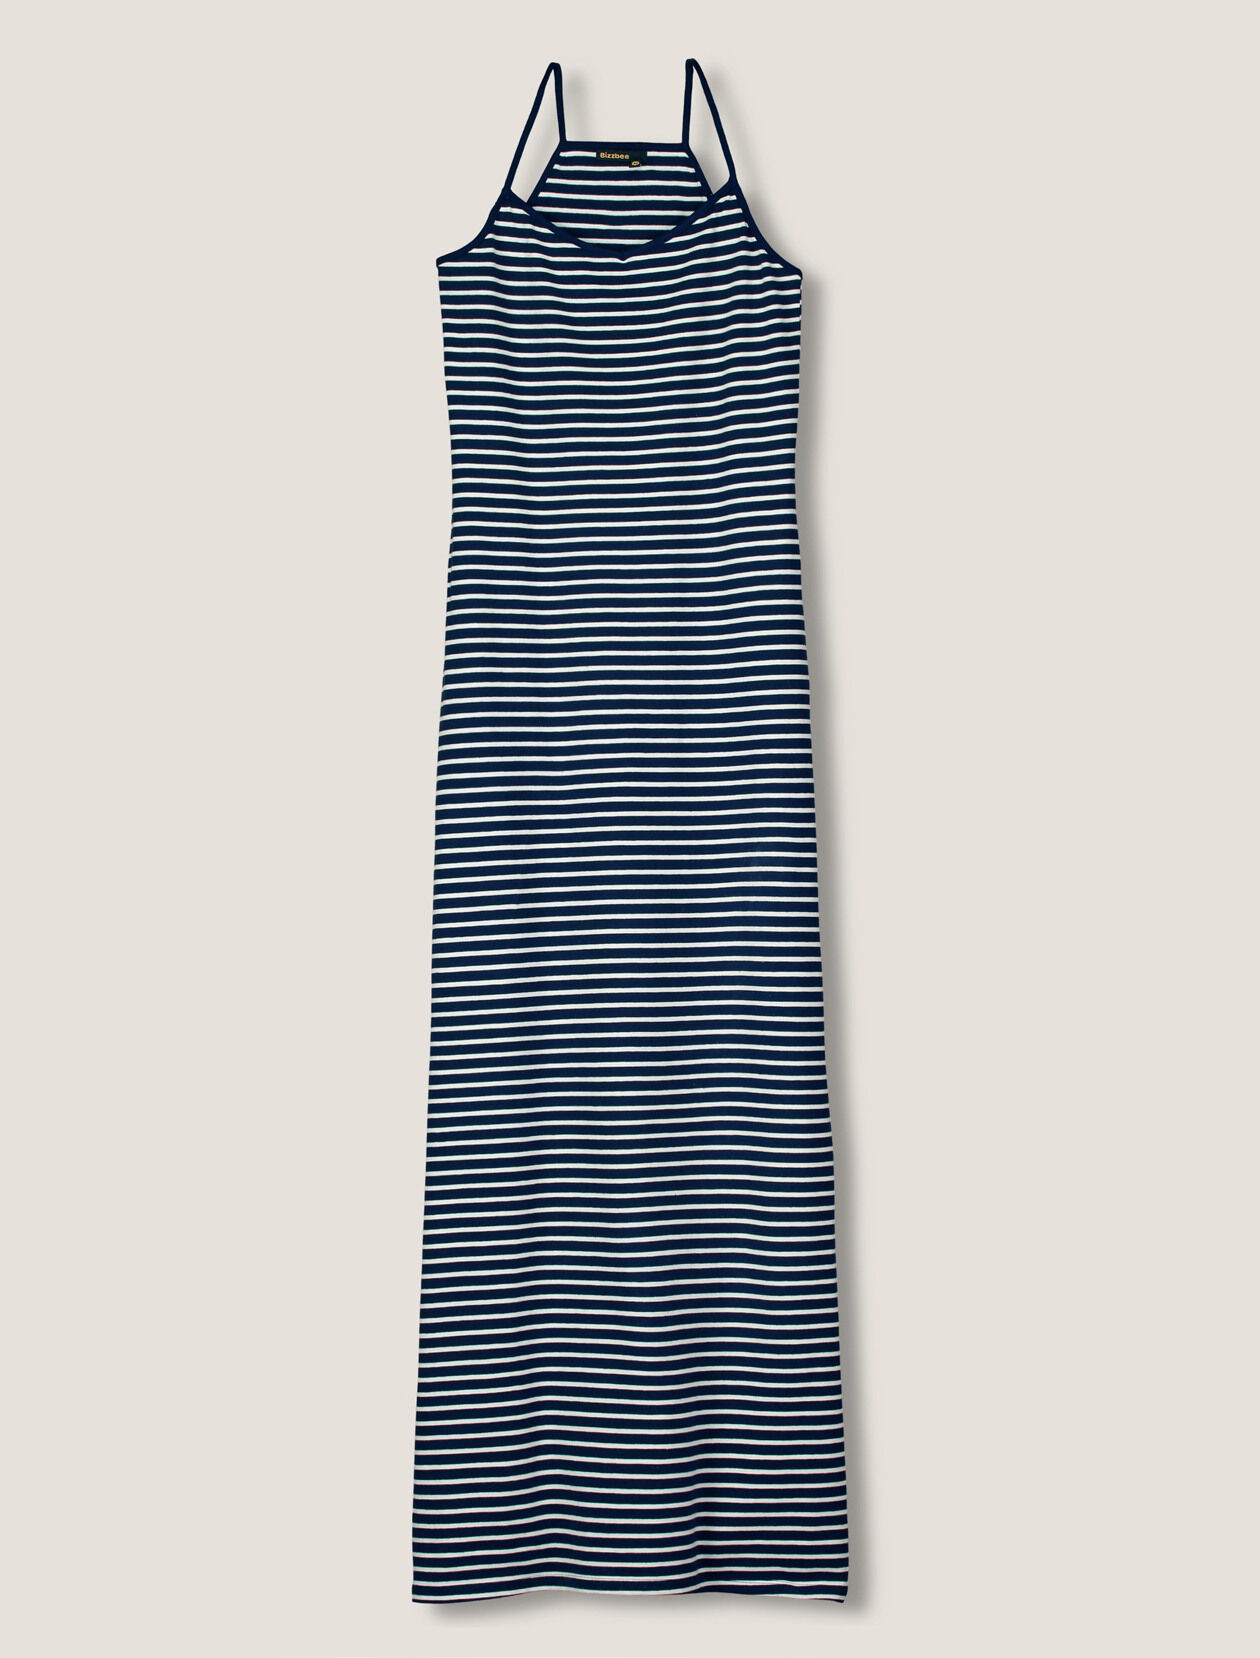 Robe longue mariniere pas cher